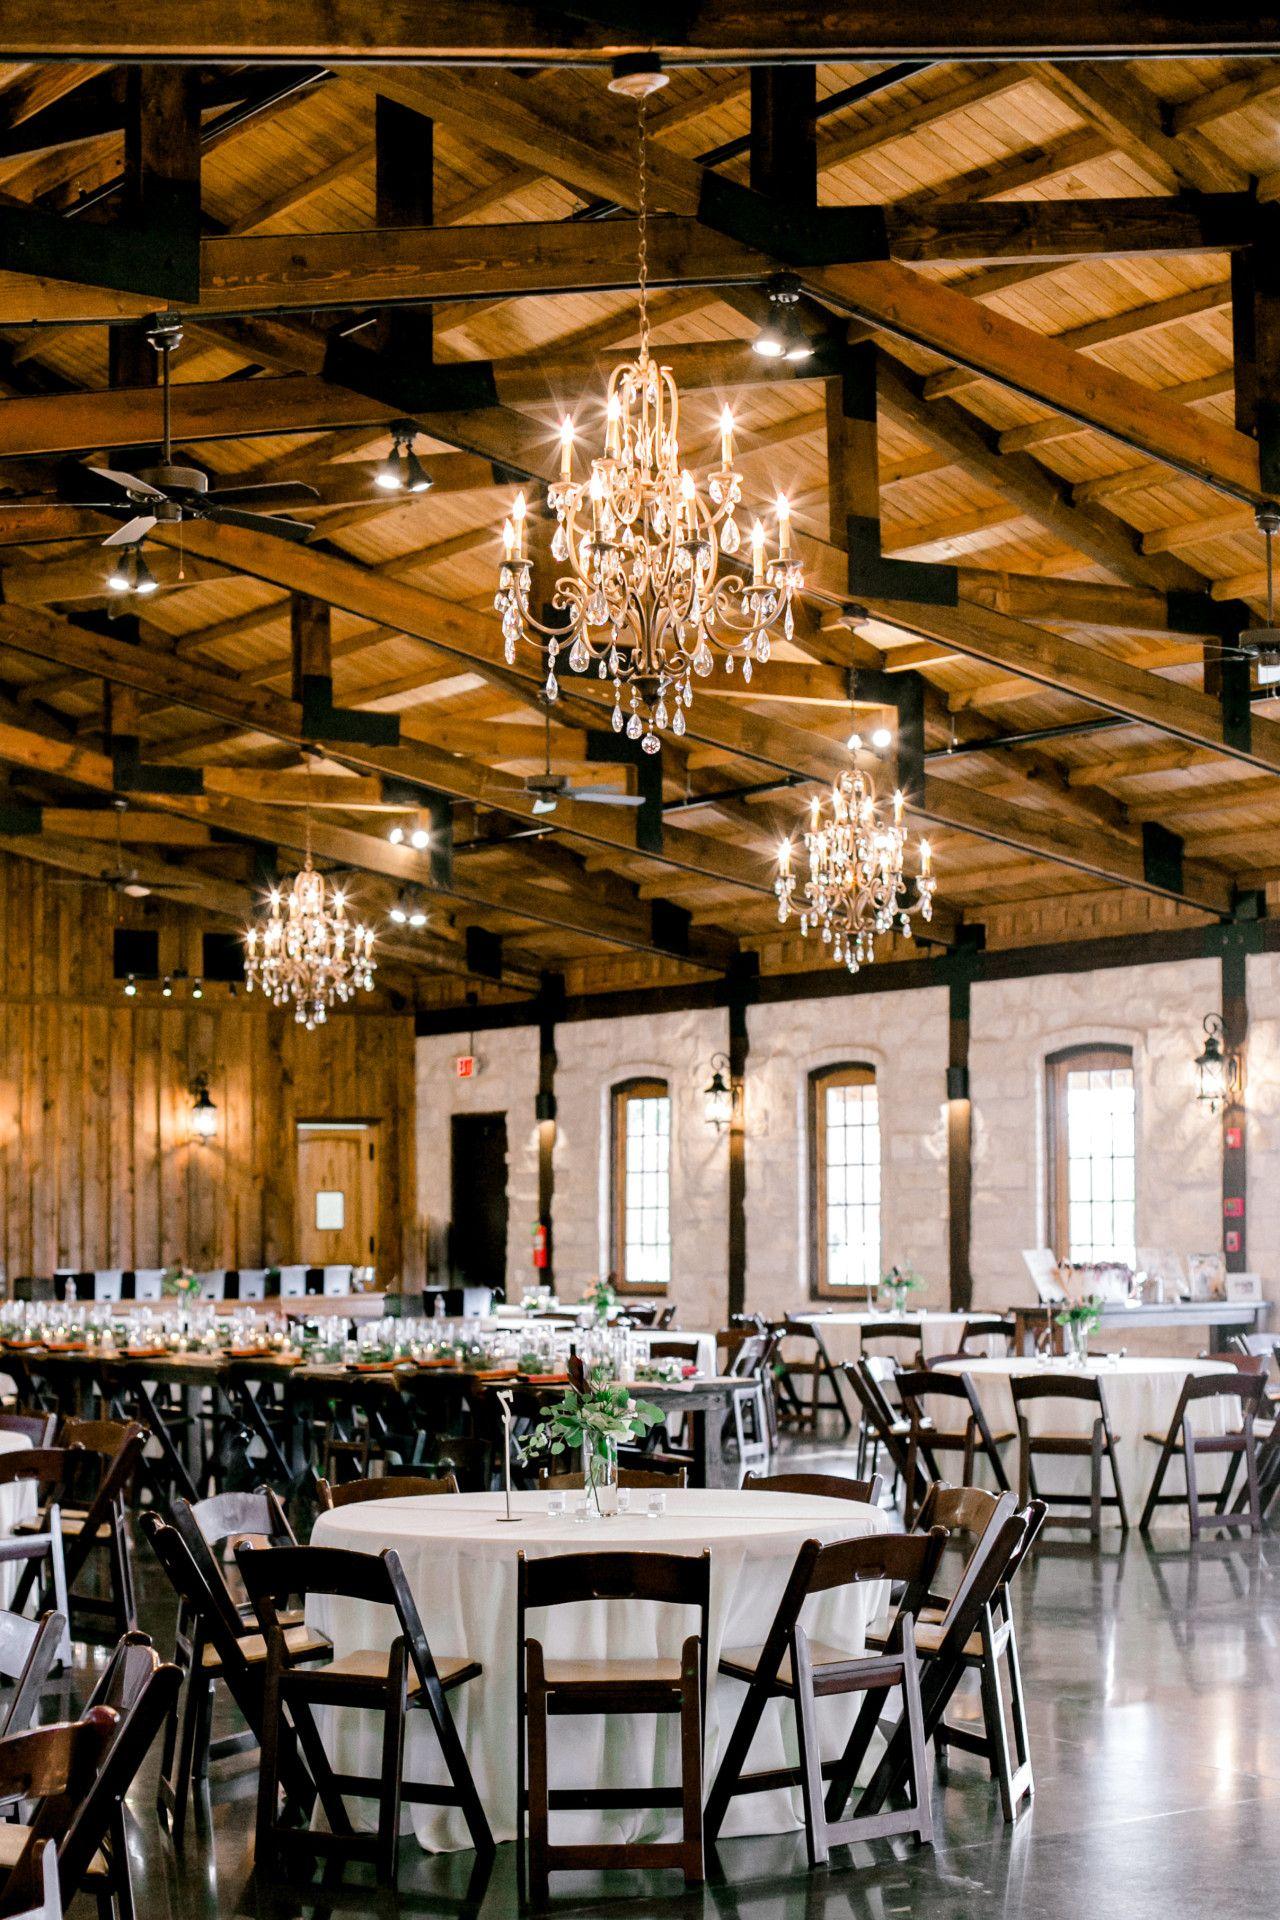 Wedding Venue Norman Oklahoma (With images) | Wedding ...